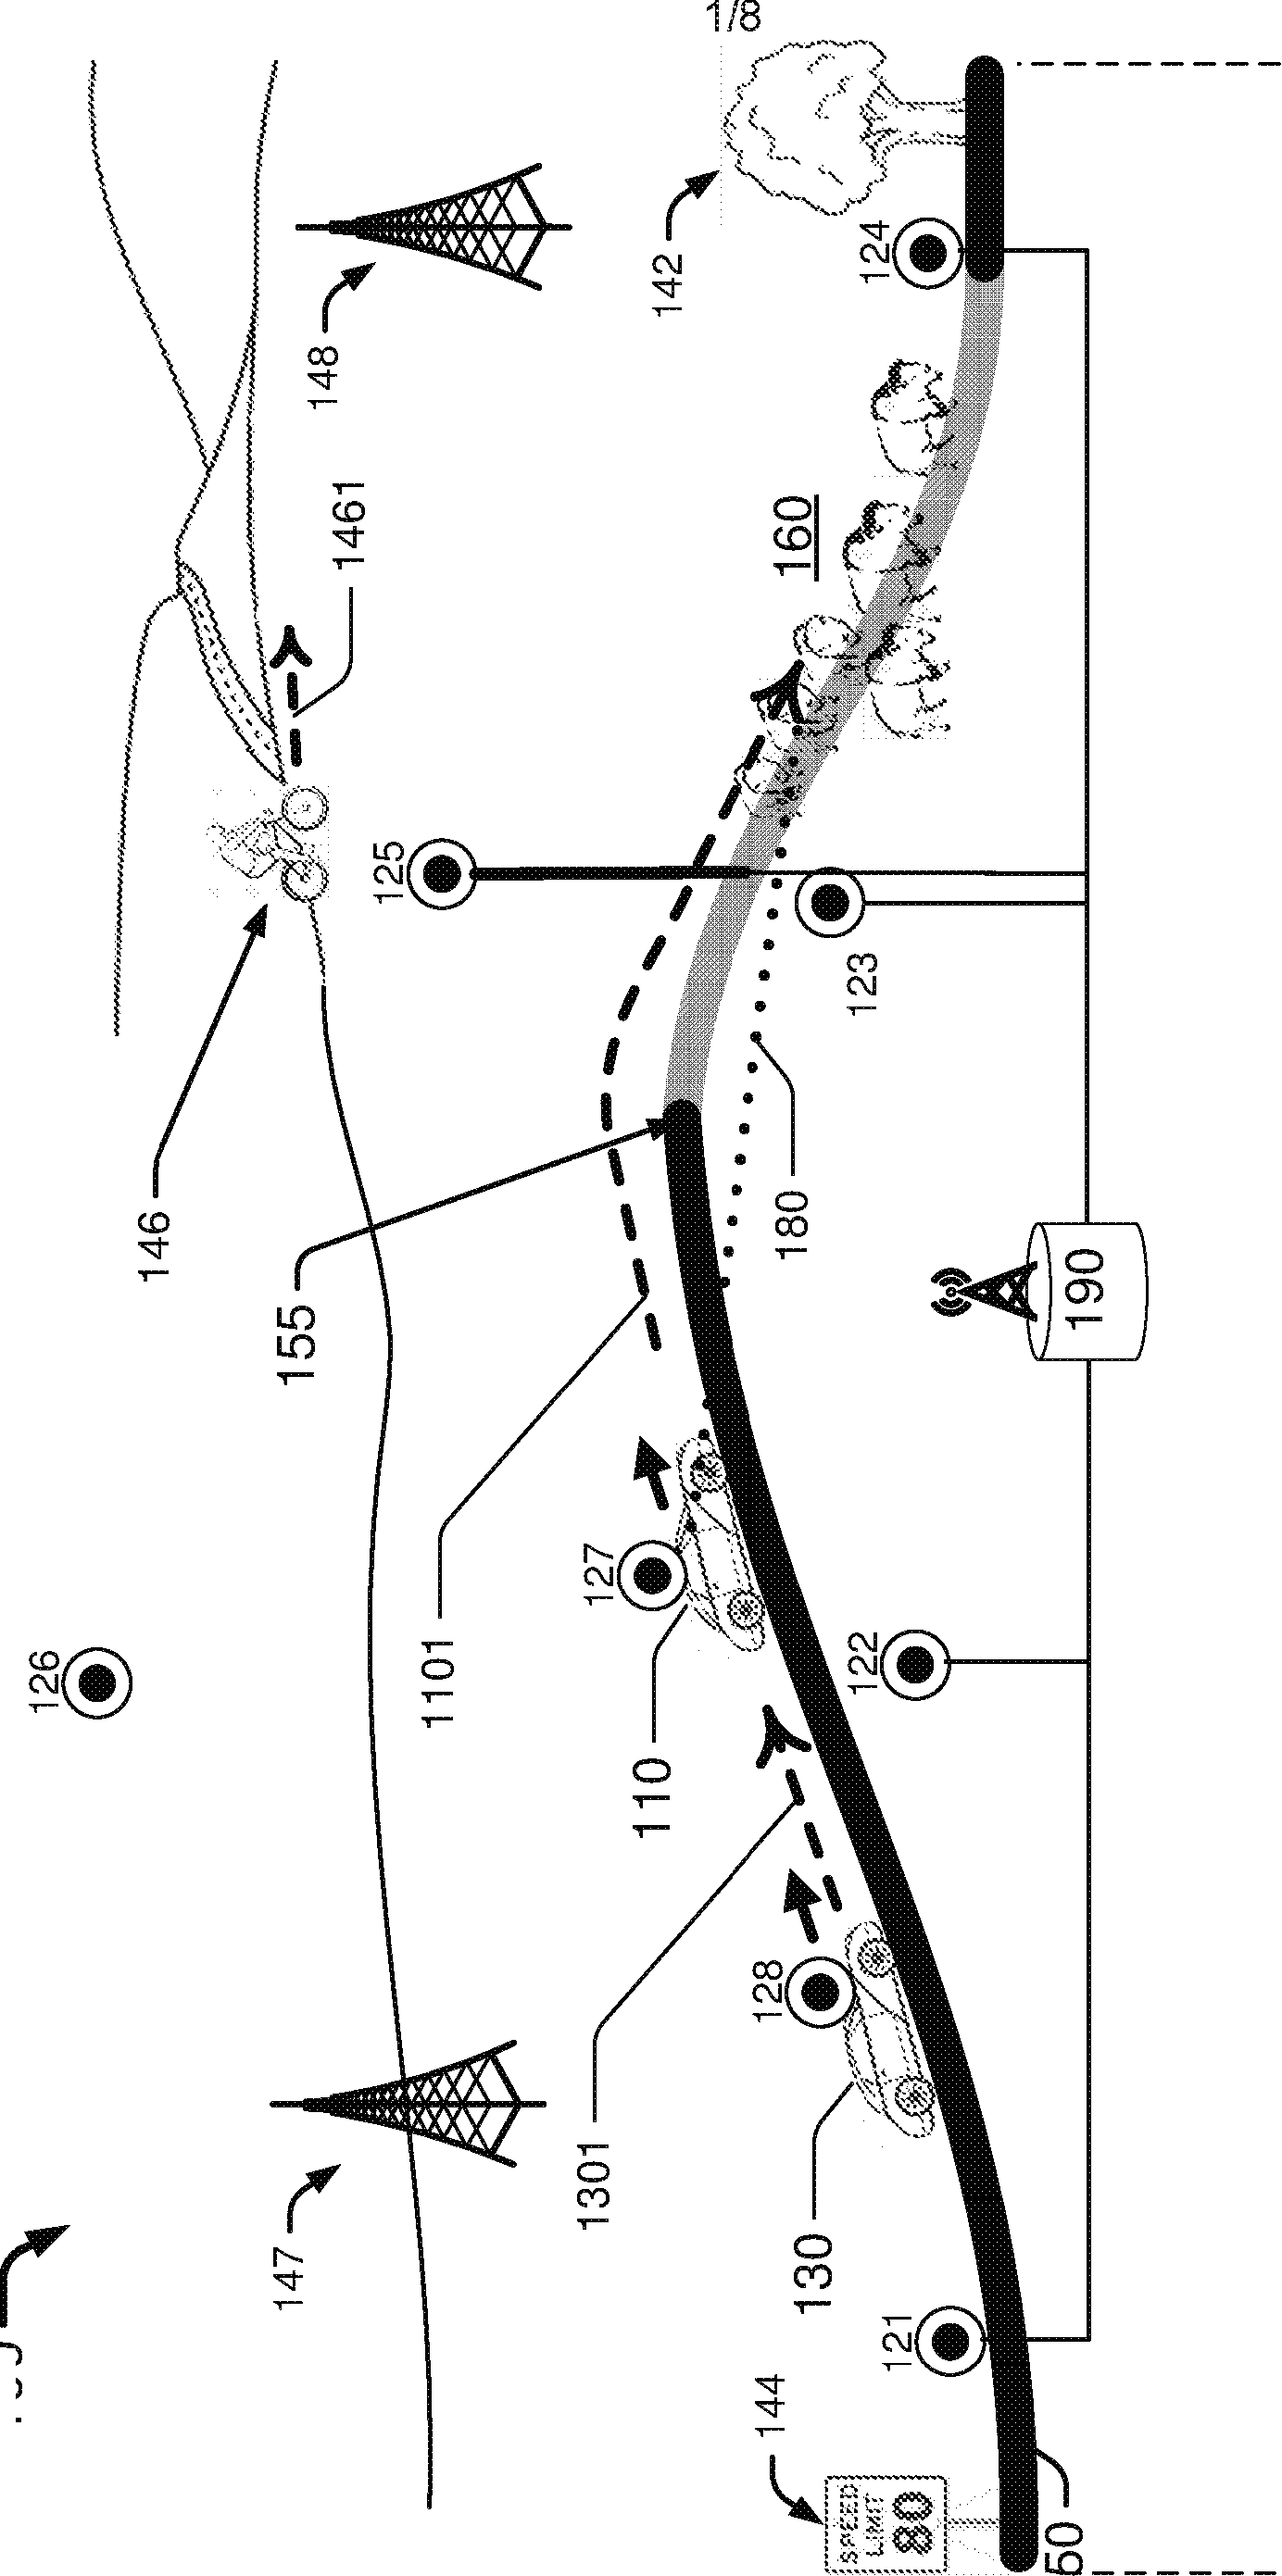 Figure GB2552241A_D0001